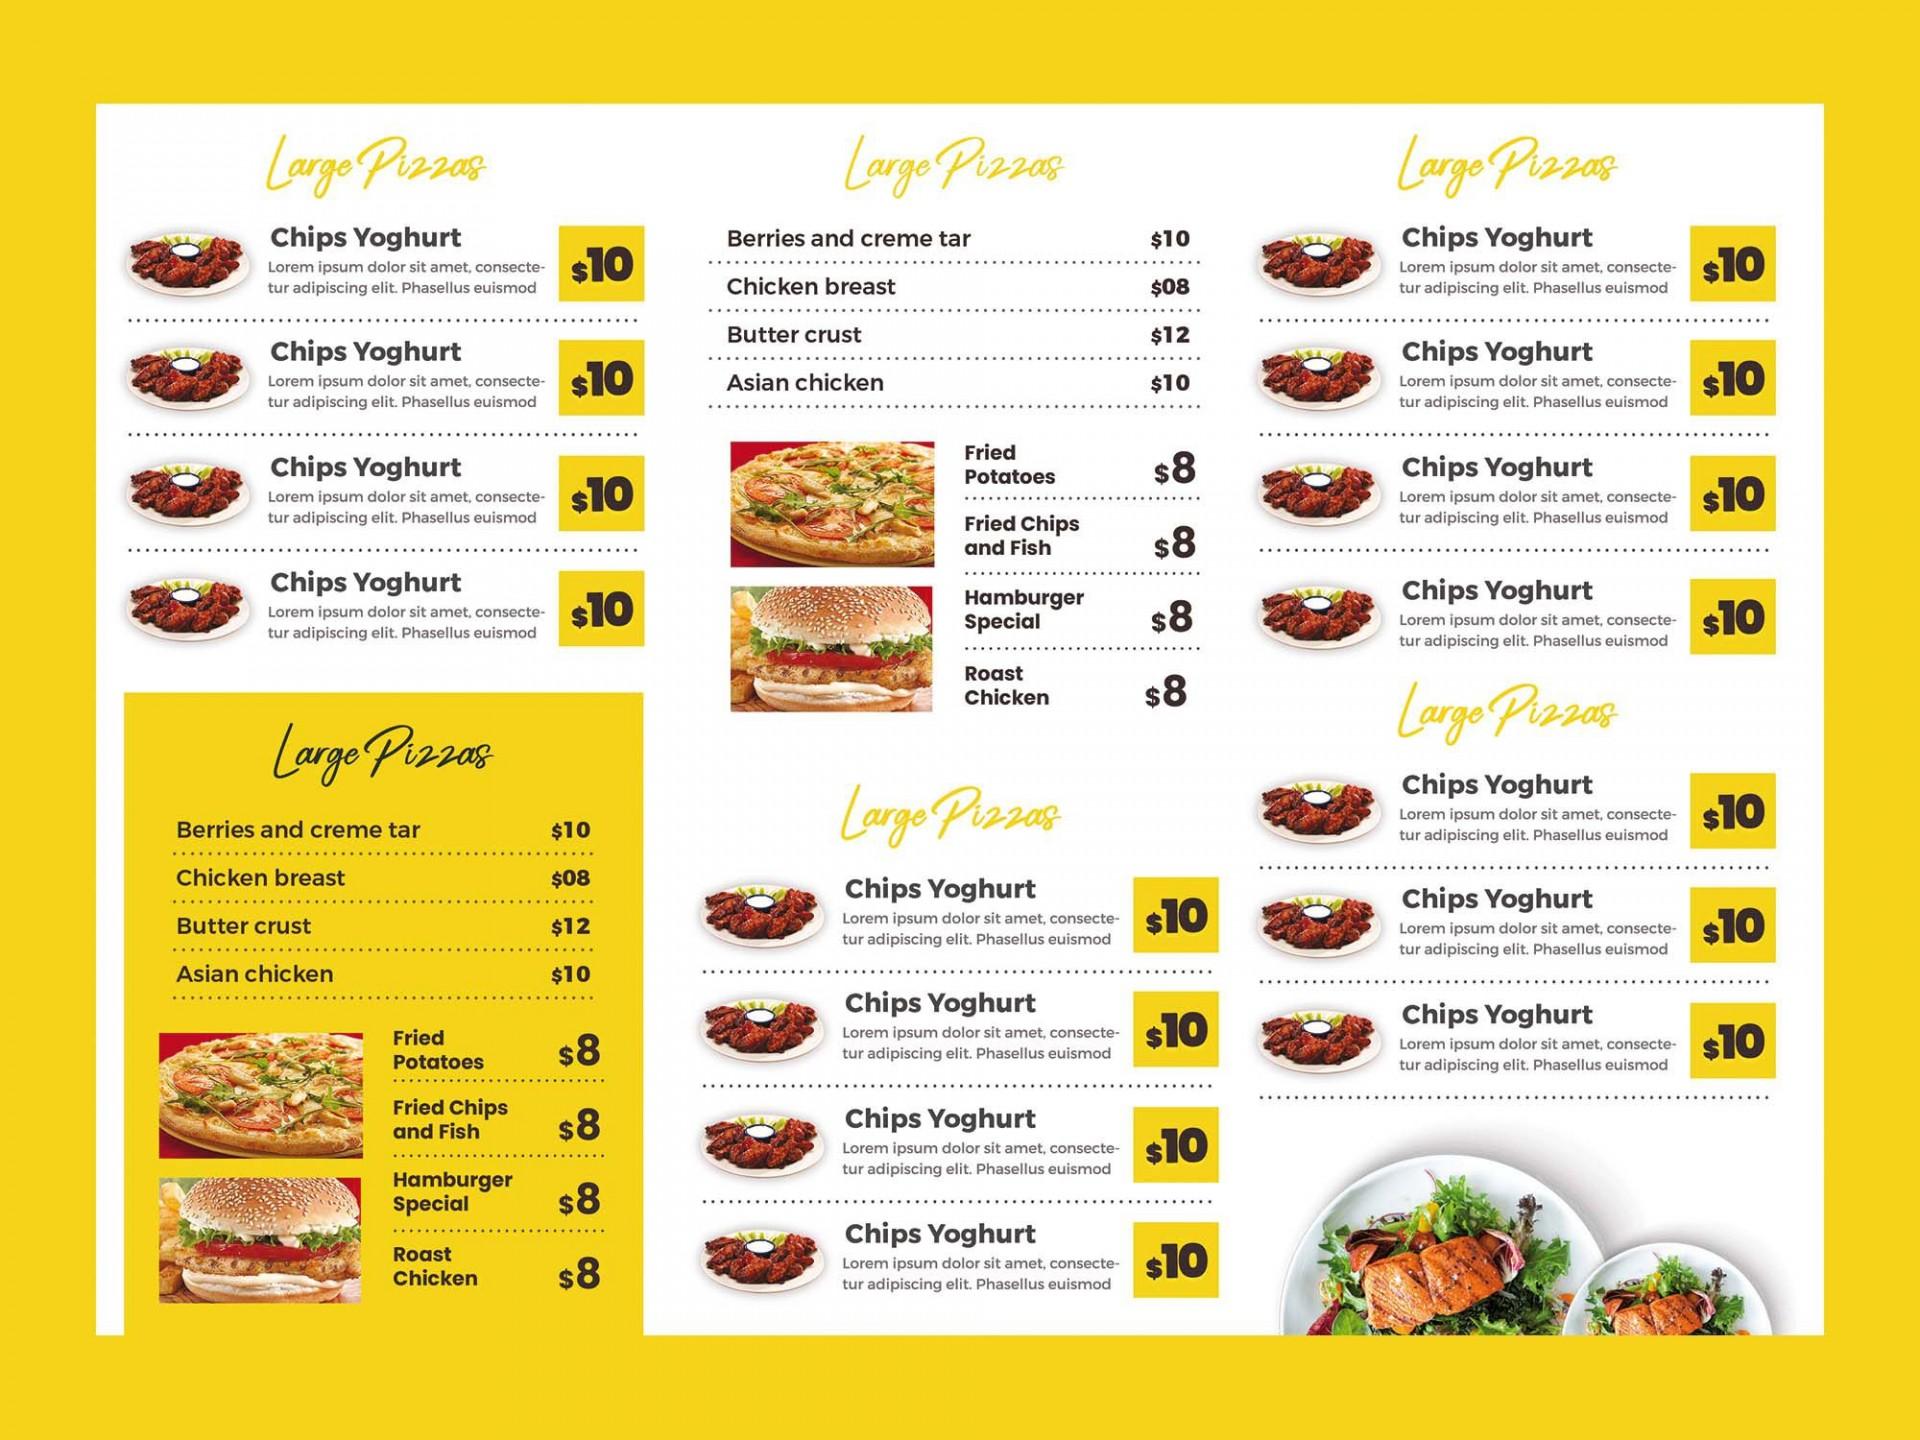 005 Magnificent Tri Fold Menu Template Photo  Templates Restaurant Tri-fold Food Free Psd1920